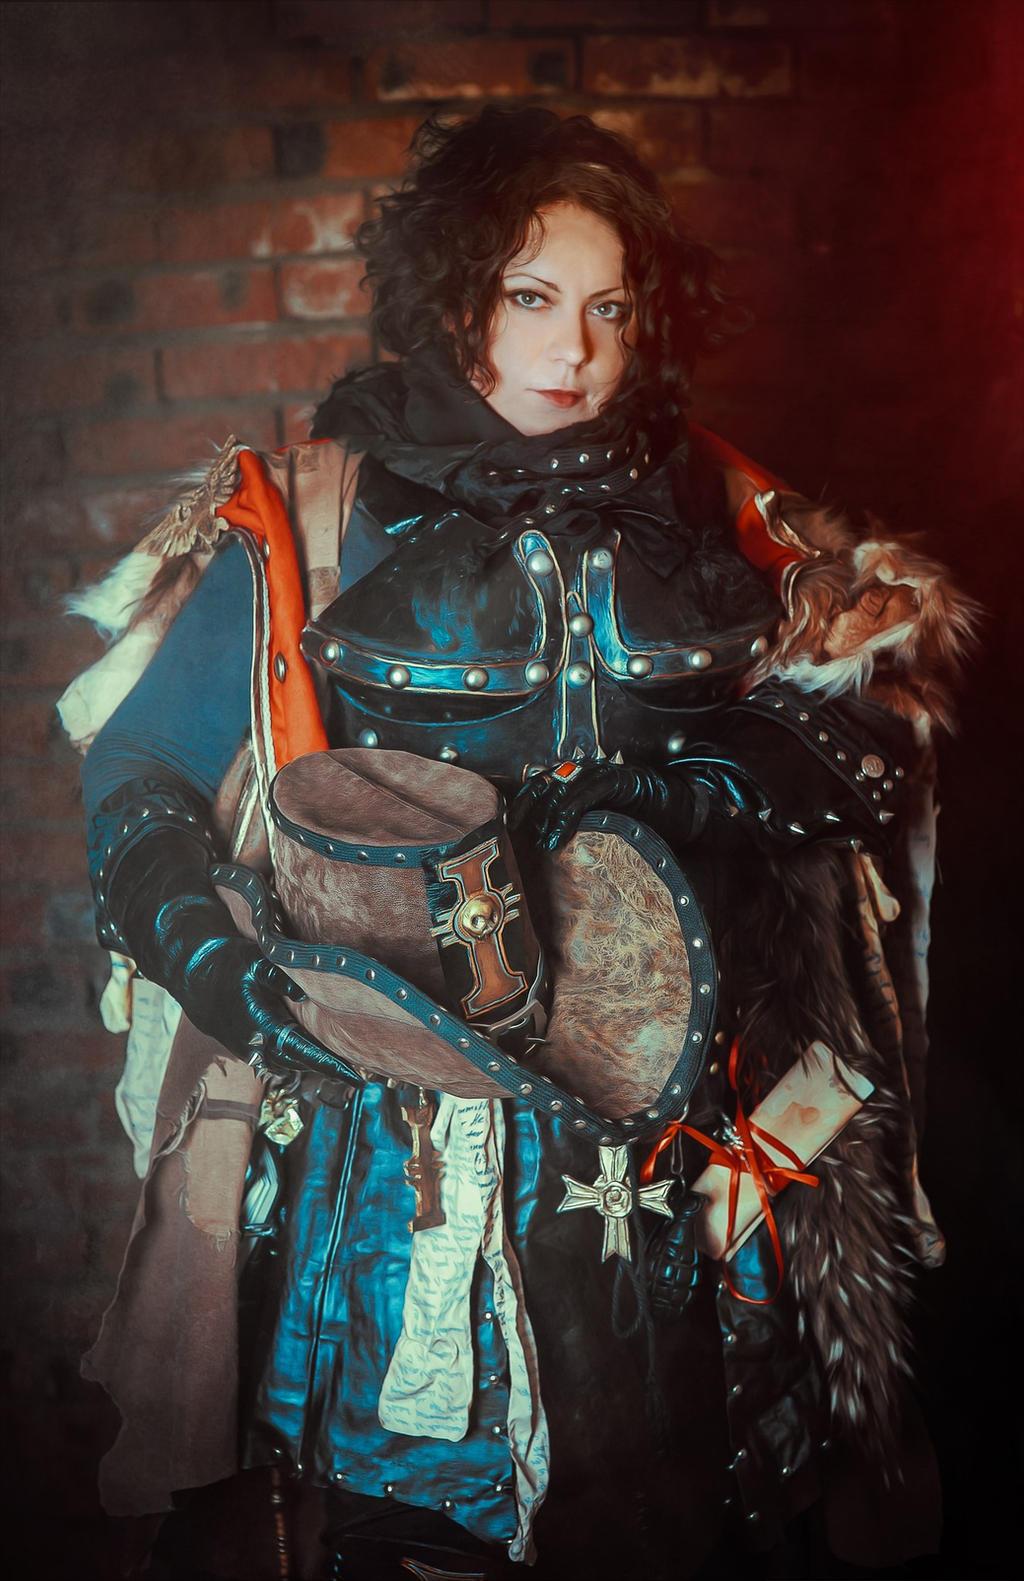 Warhammer 40 000 Cosplay - Inquisitor by alberti